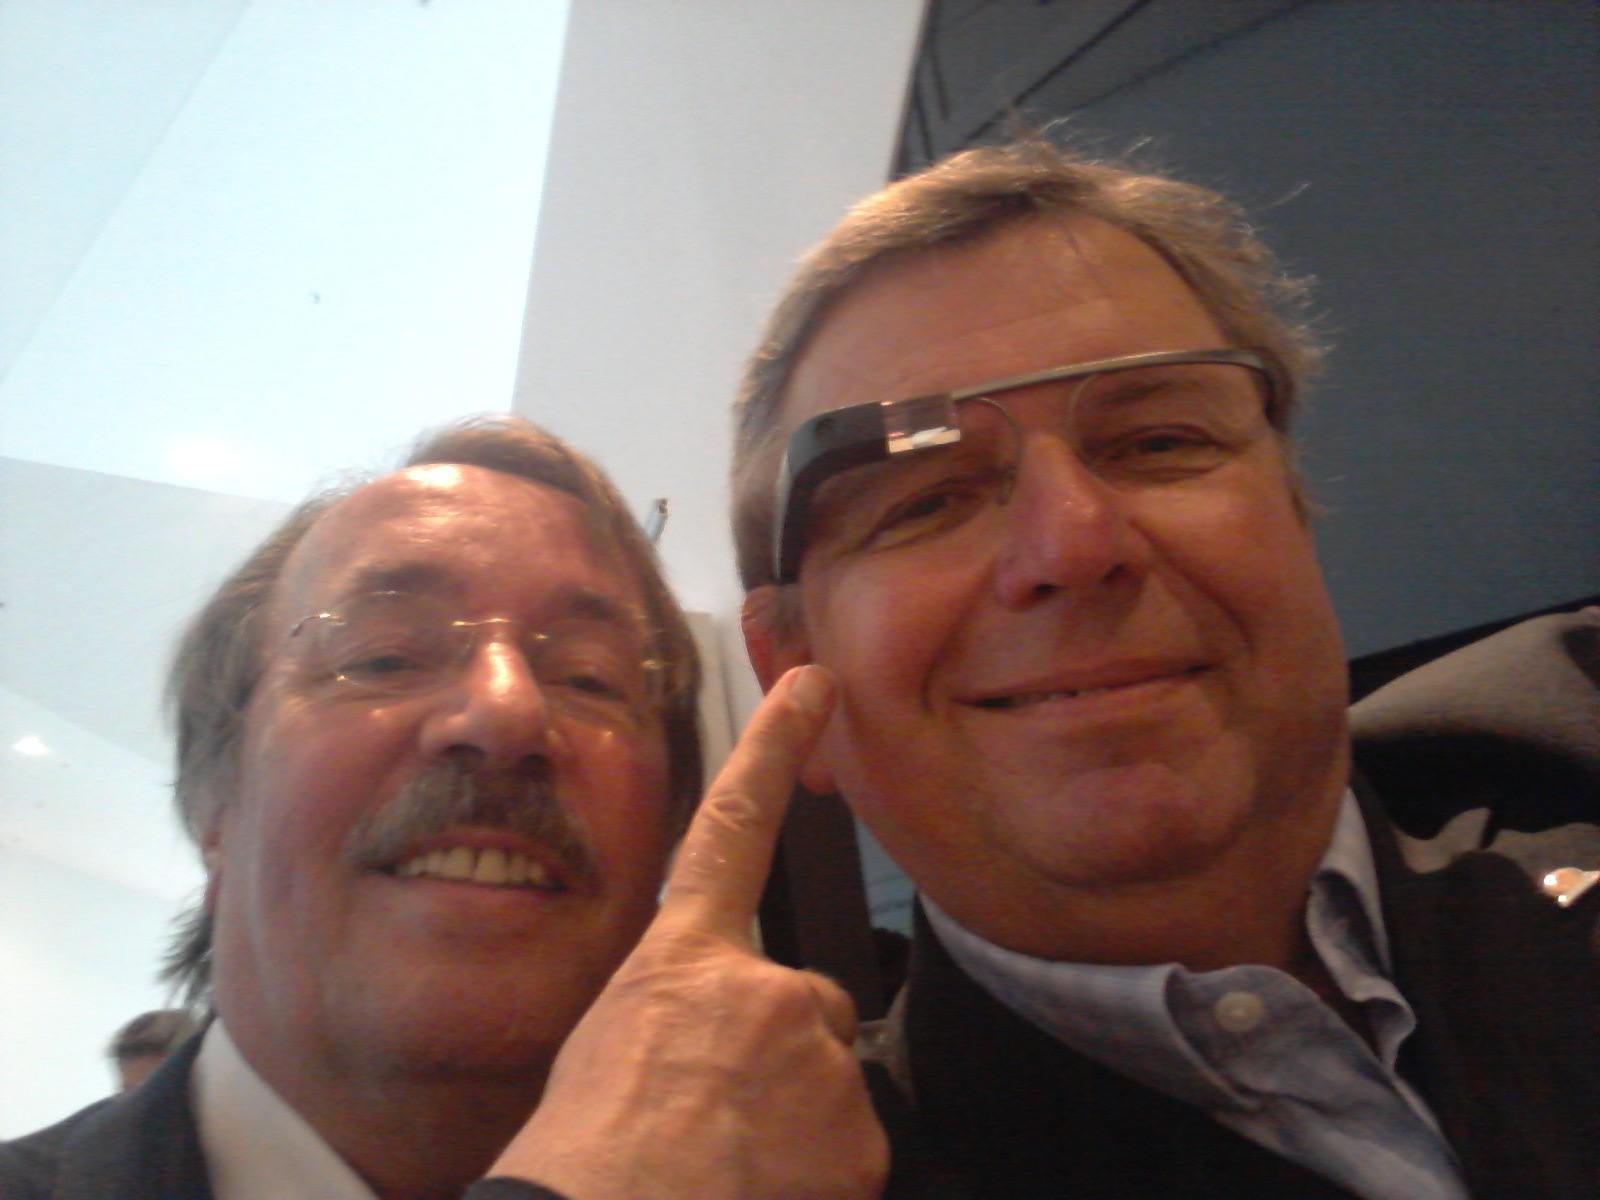 googleglaslouis&jan